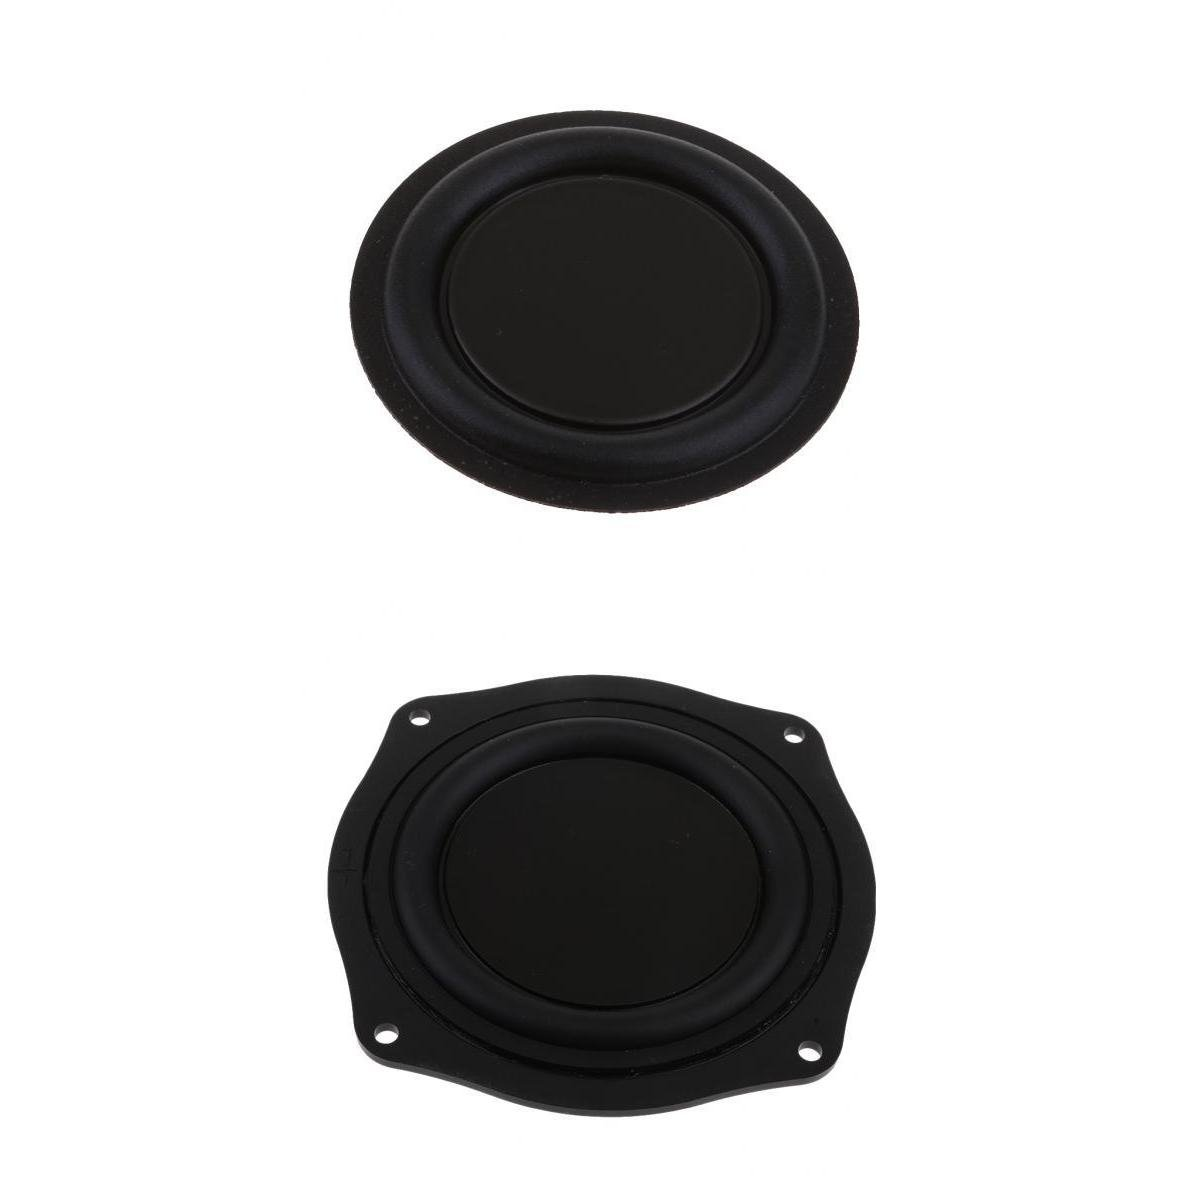 perfk 2pcs Boomers Haut-Parleur Passif Vibration Diaphragme 11.4x11.4x1.3 cm